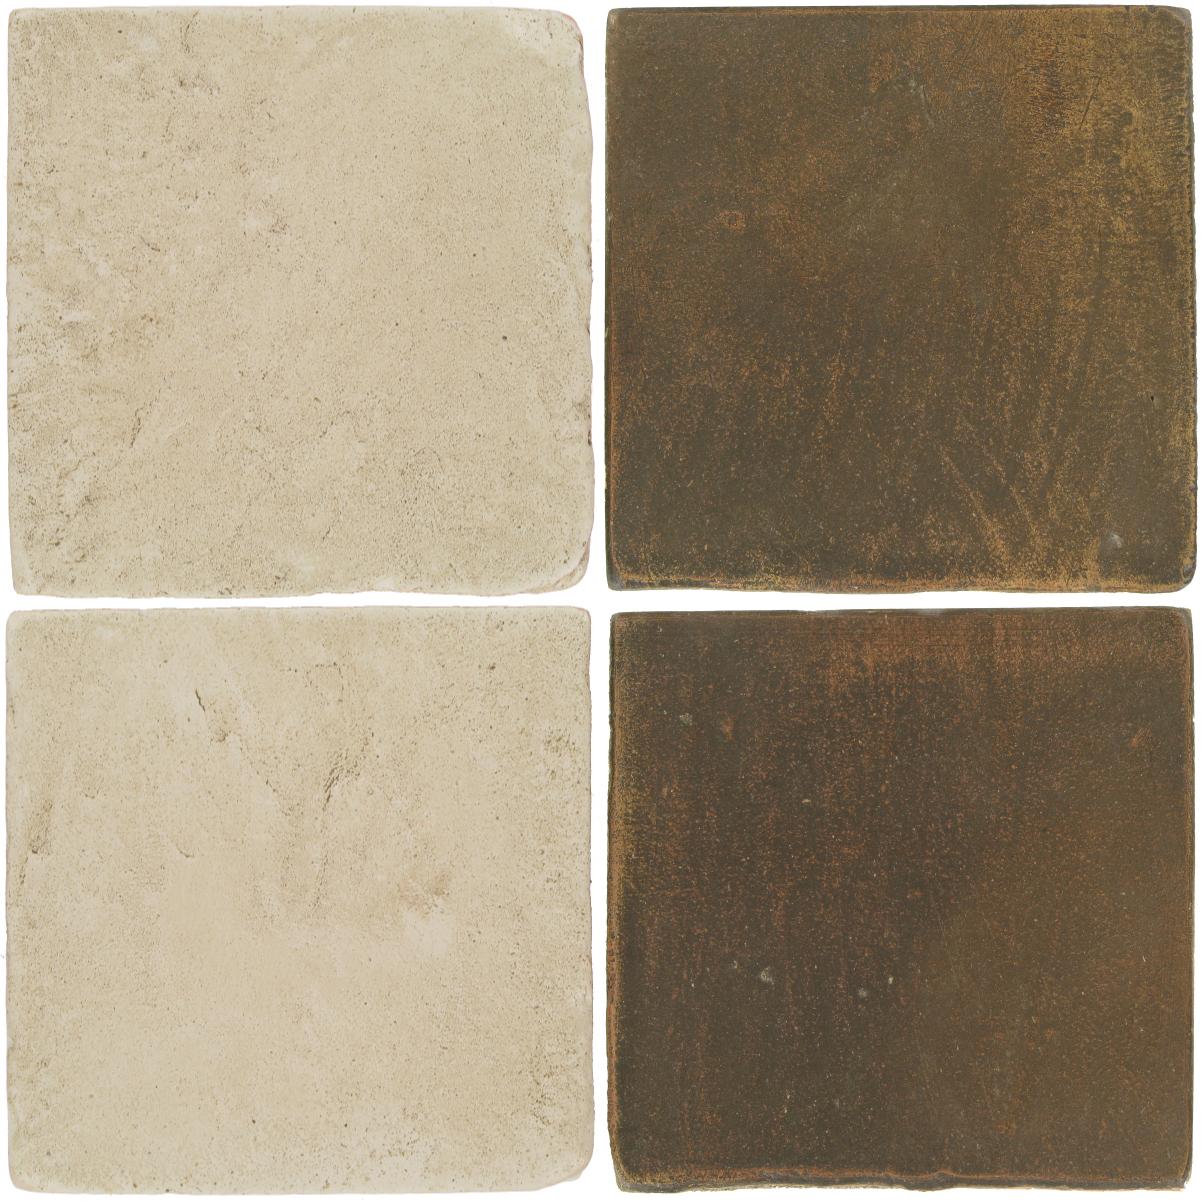 Pedralbes Antique Terracotta  2 Color Combinations  VTG-PGLW Glacier White + OHS-PSVN Verona Brown